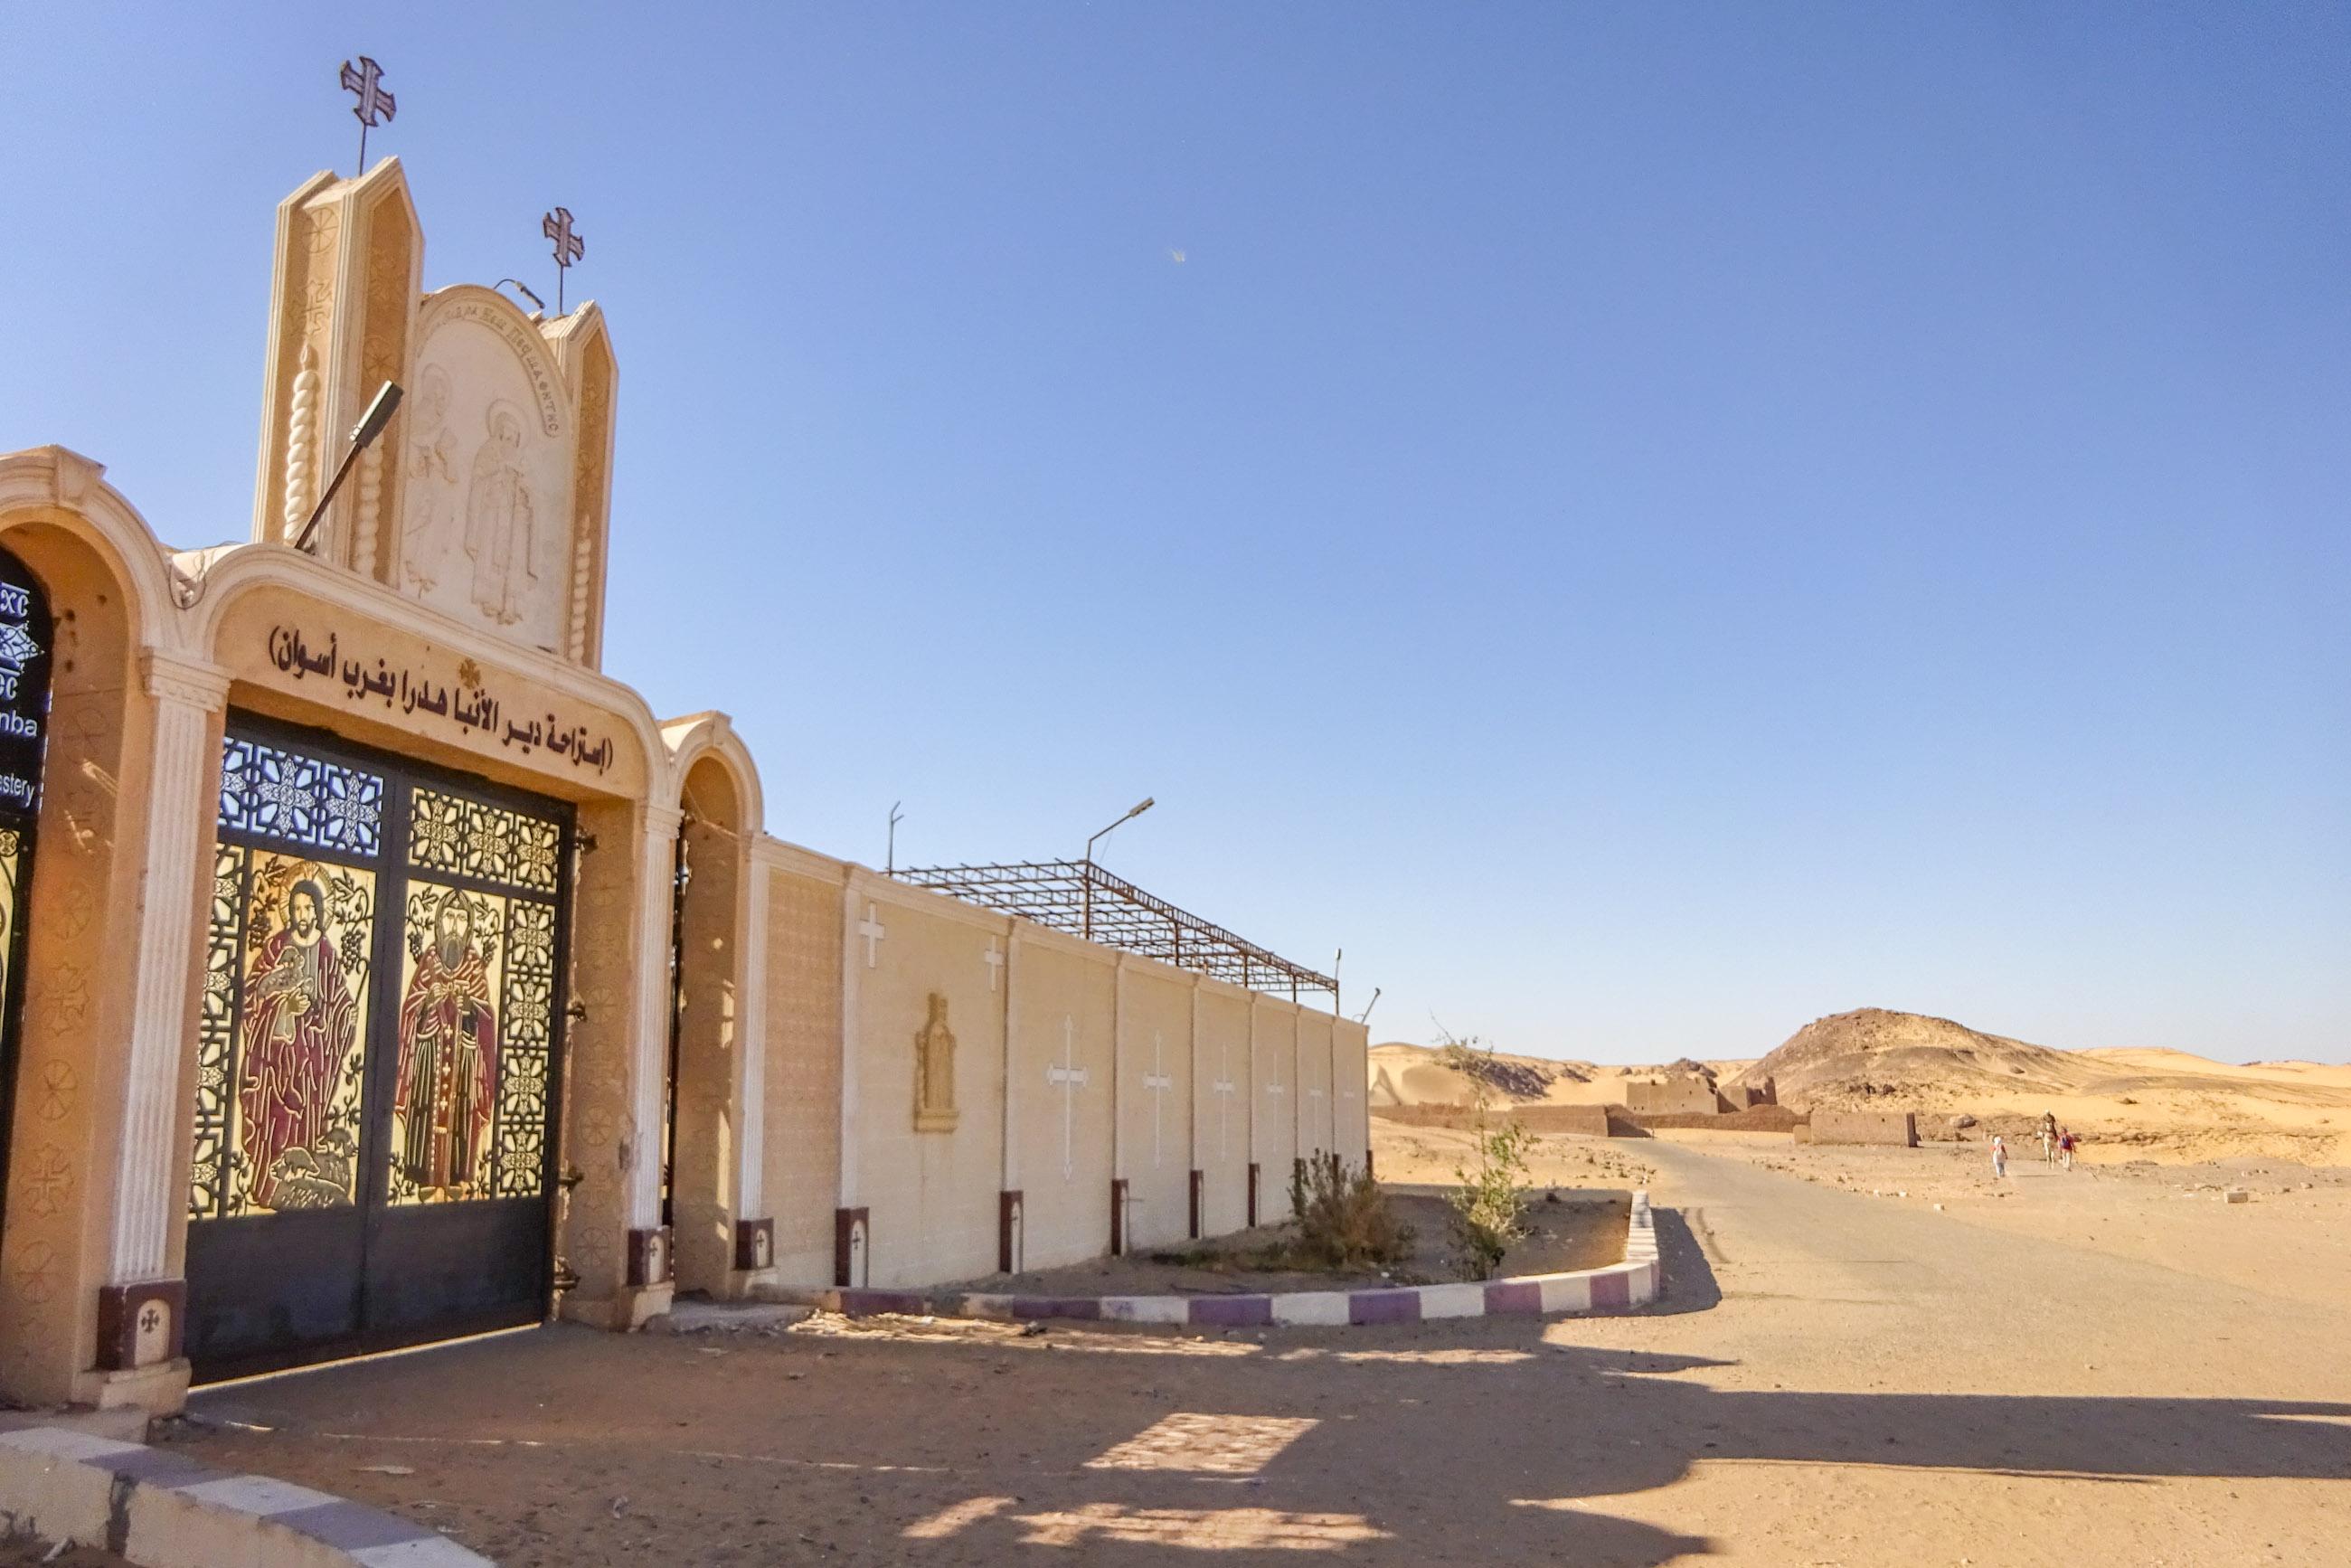 https://bubo.sk/uploads/galleries/17820/miroslavadlha_egypt_aswan-46-.jpg